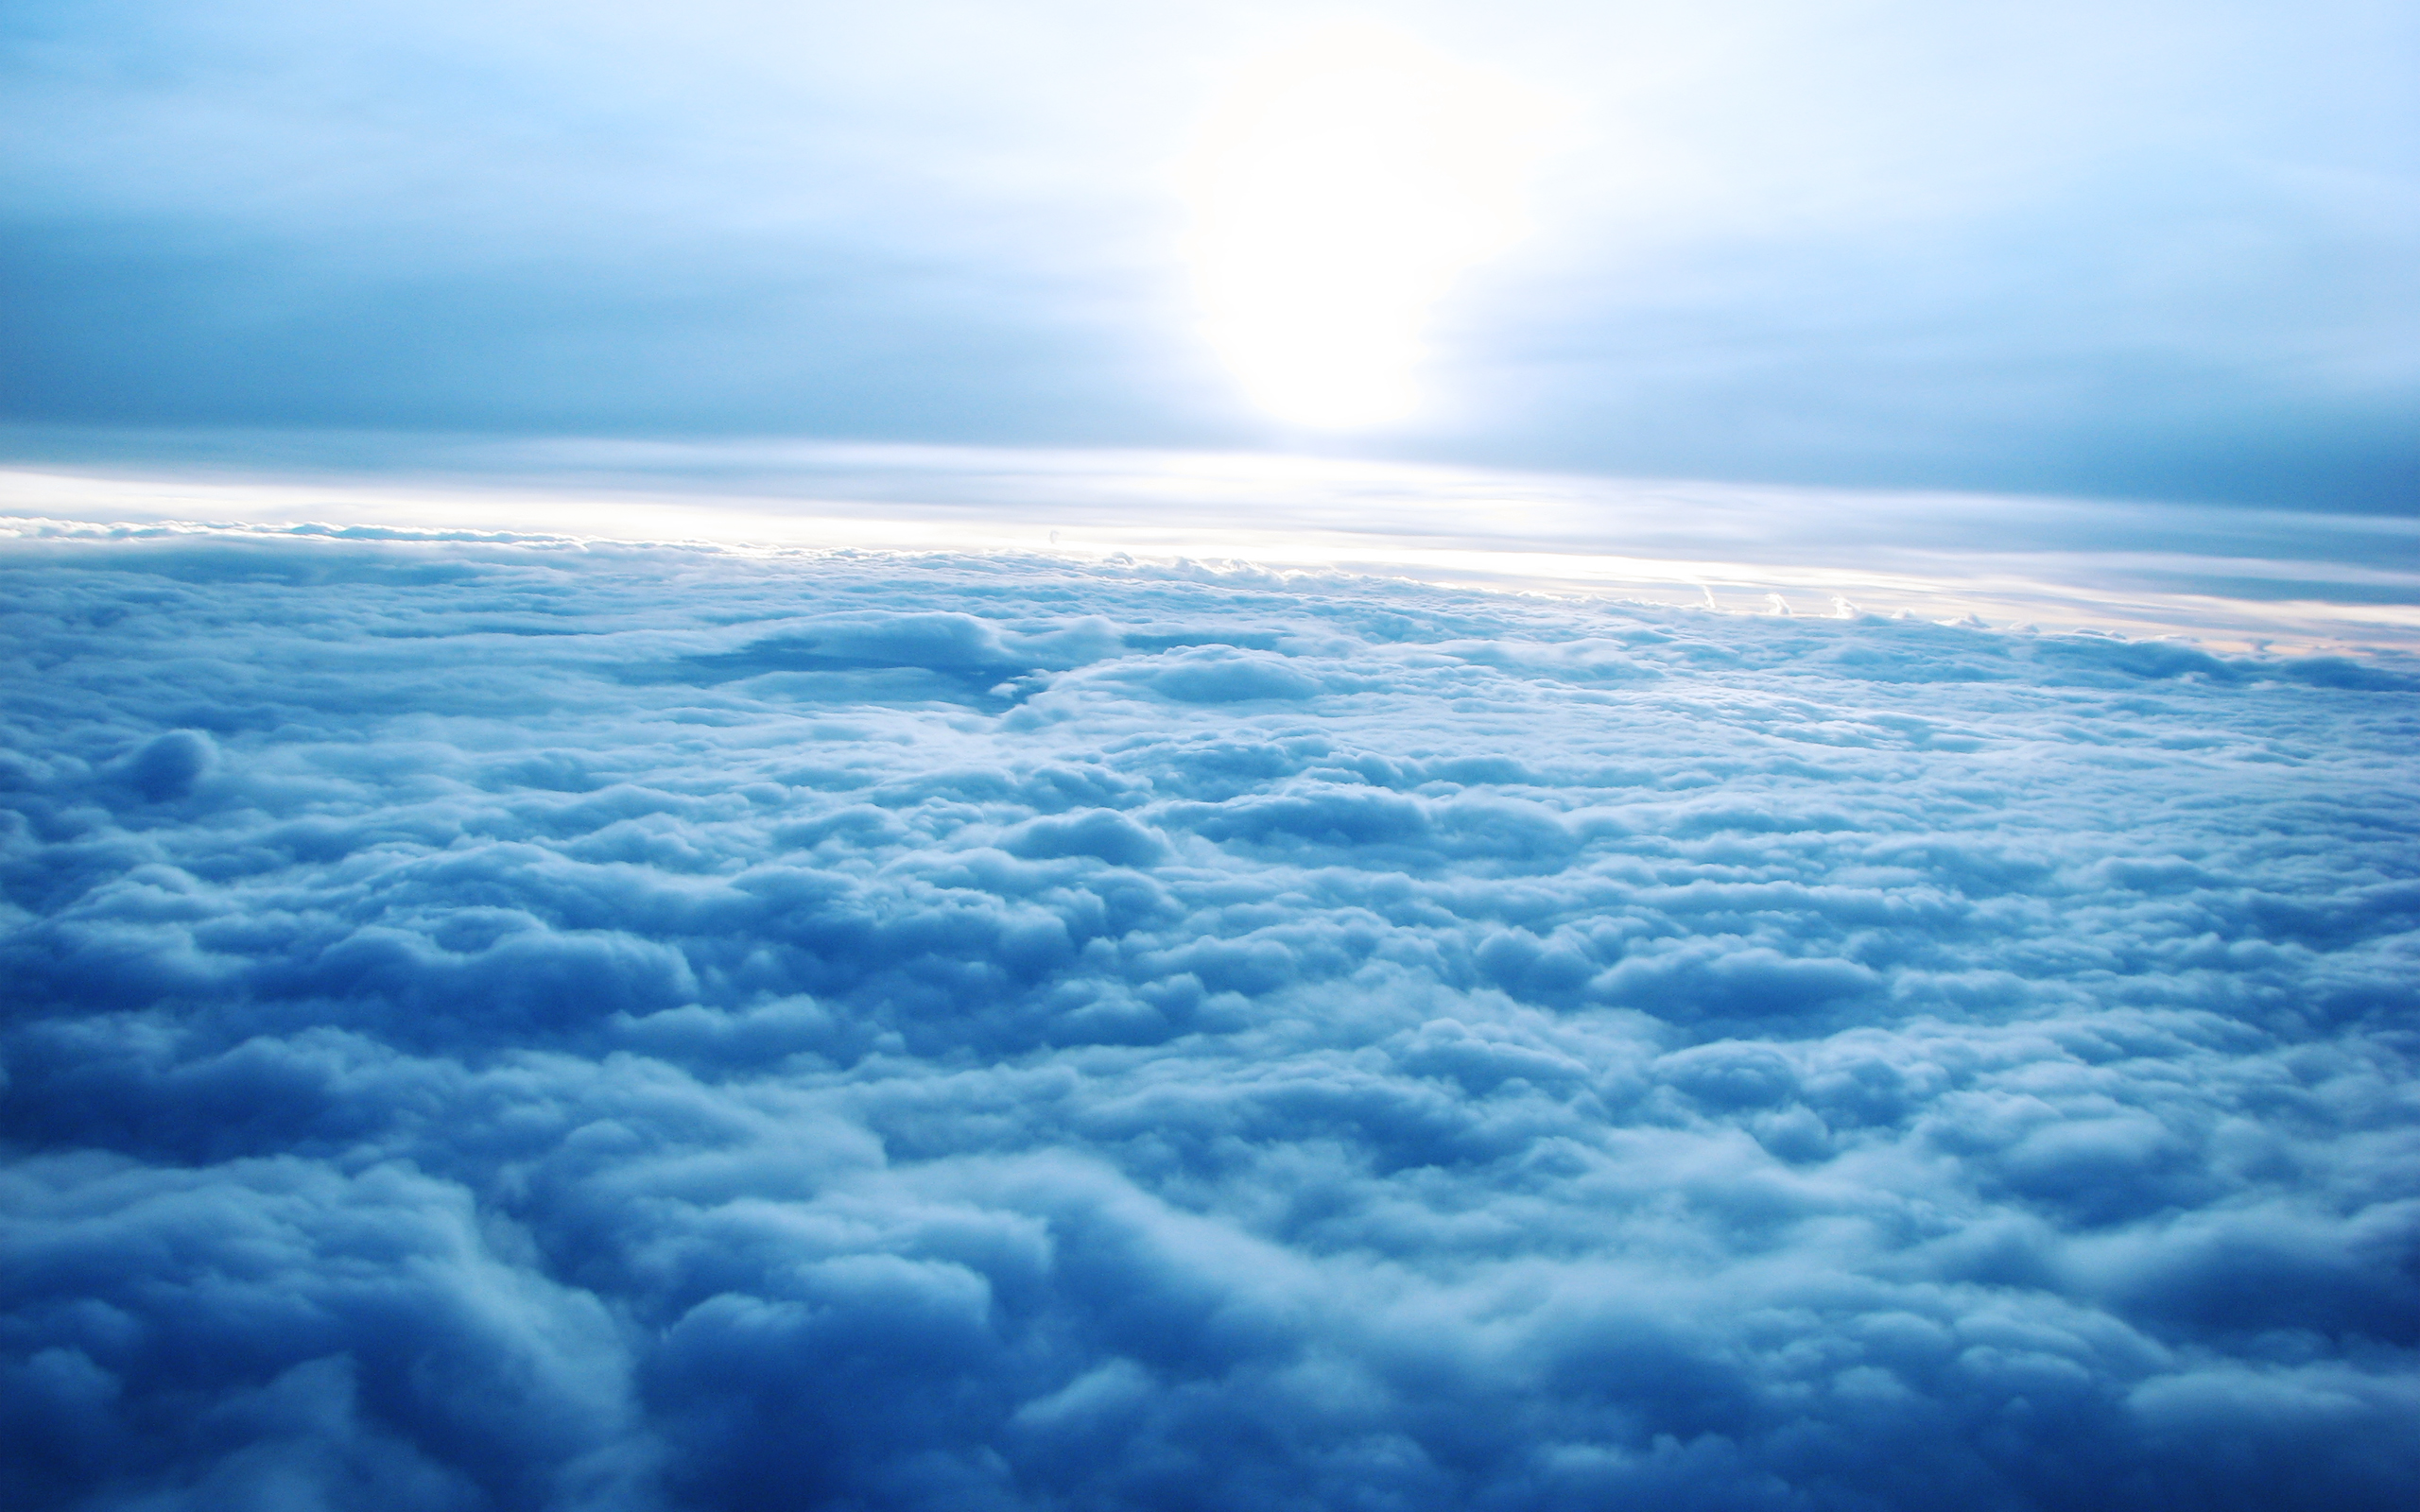 fondos nubes adnfriki (5)